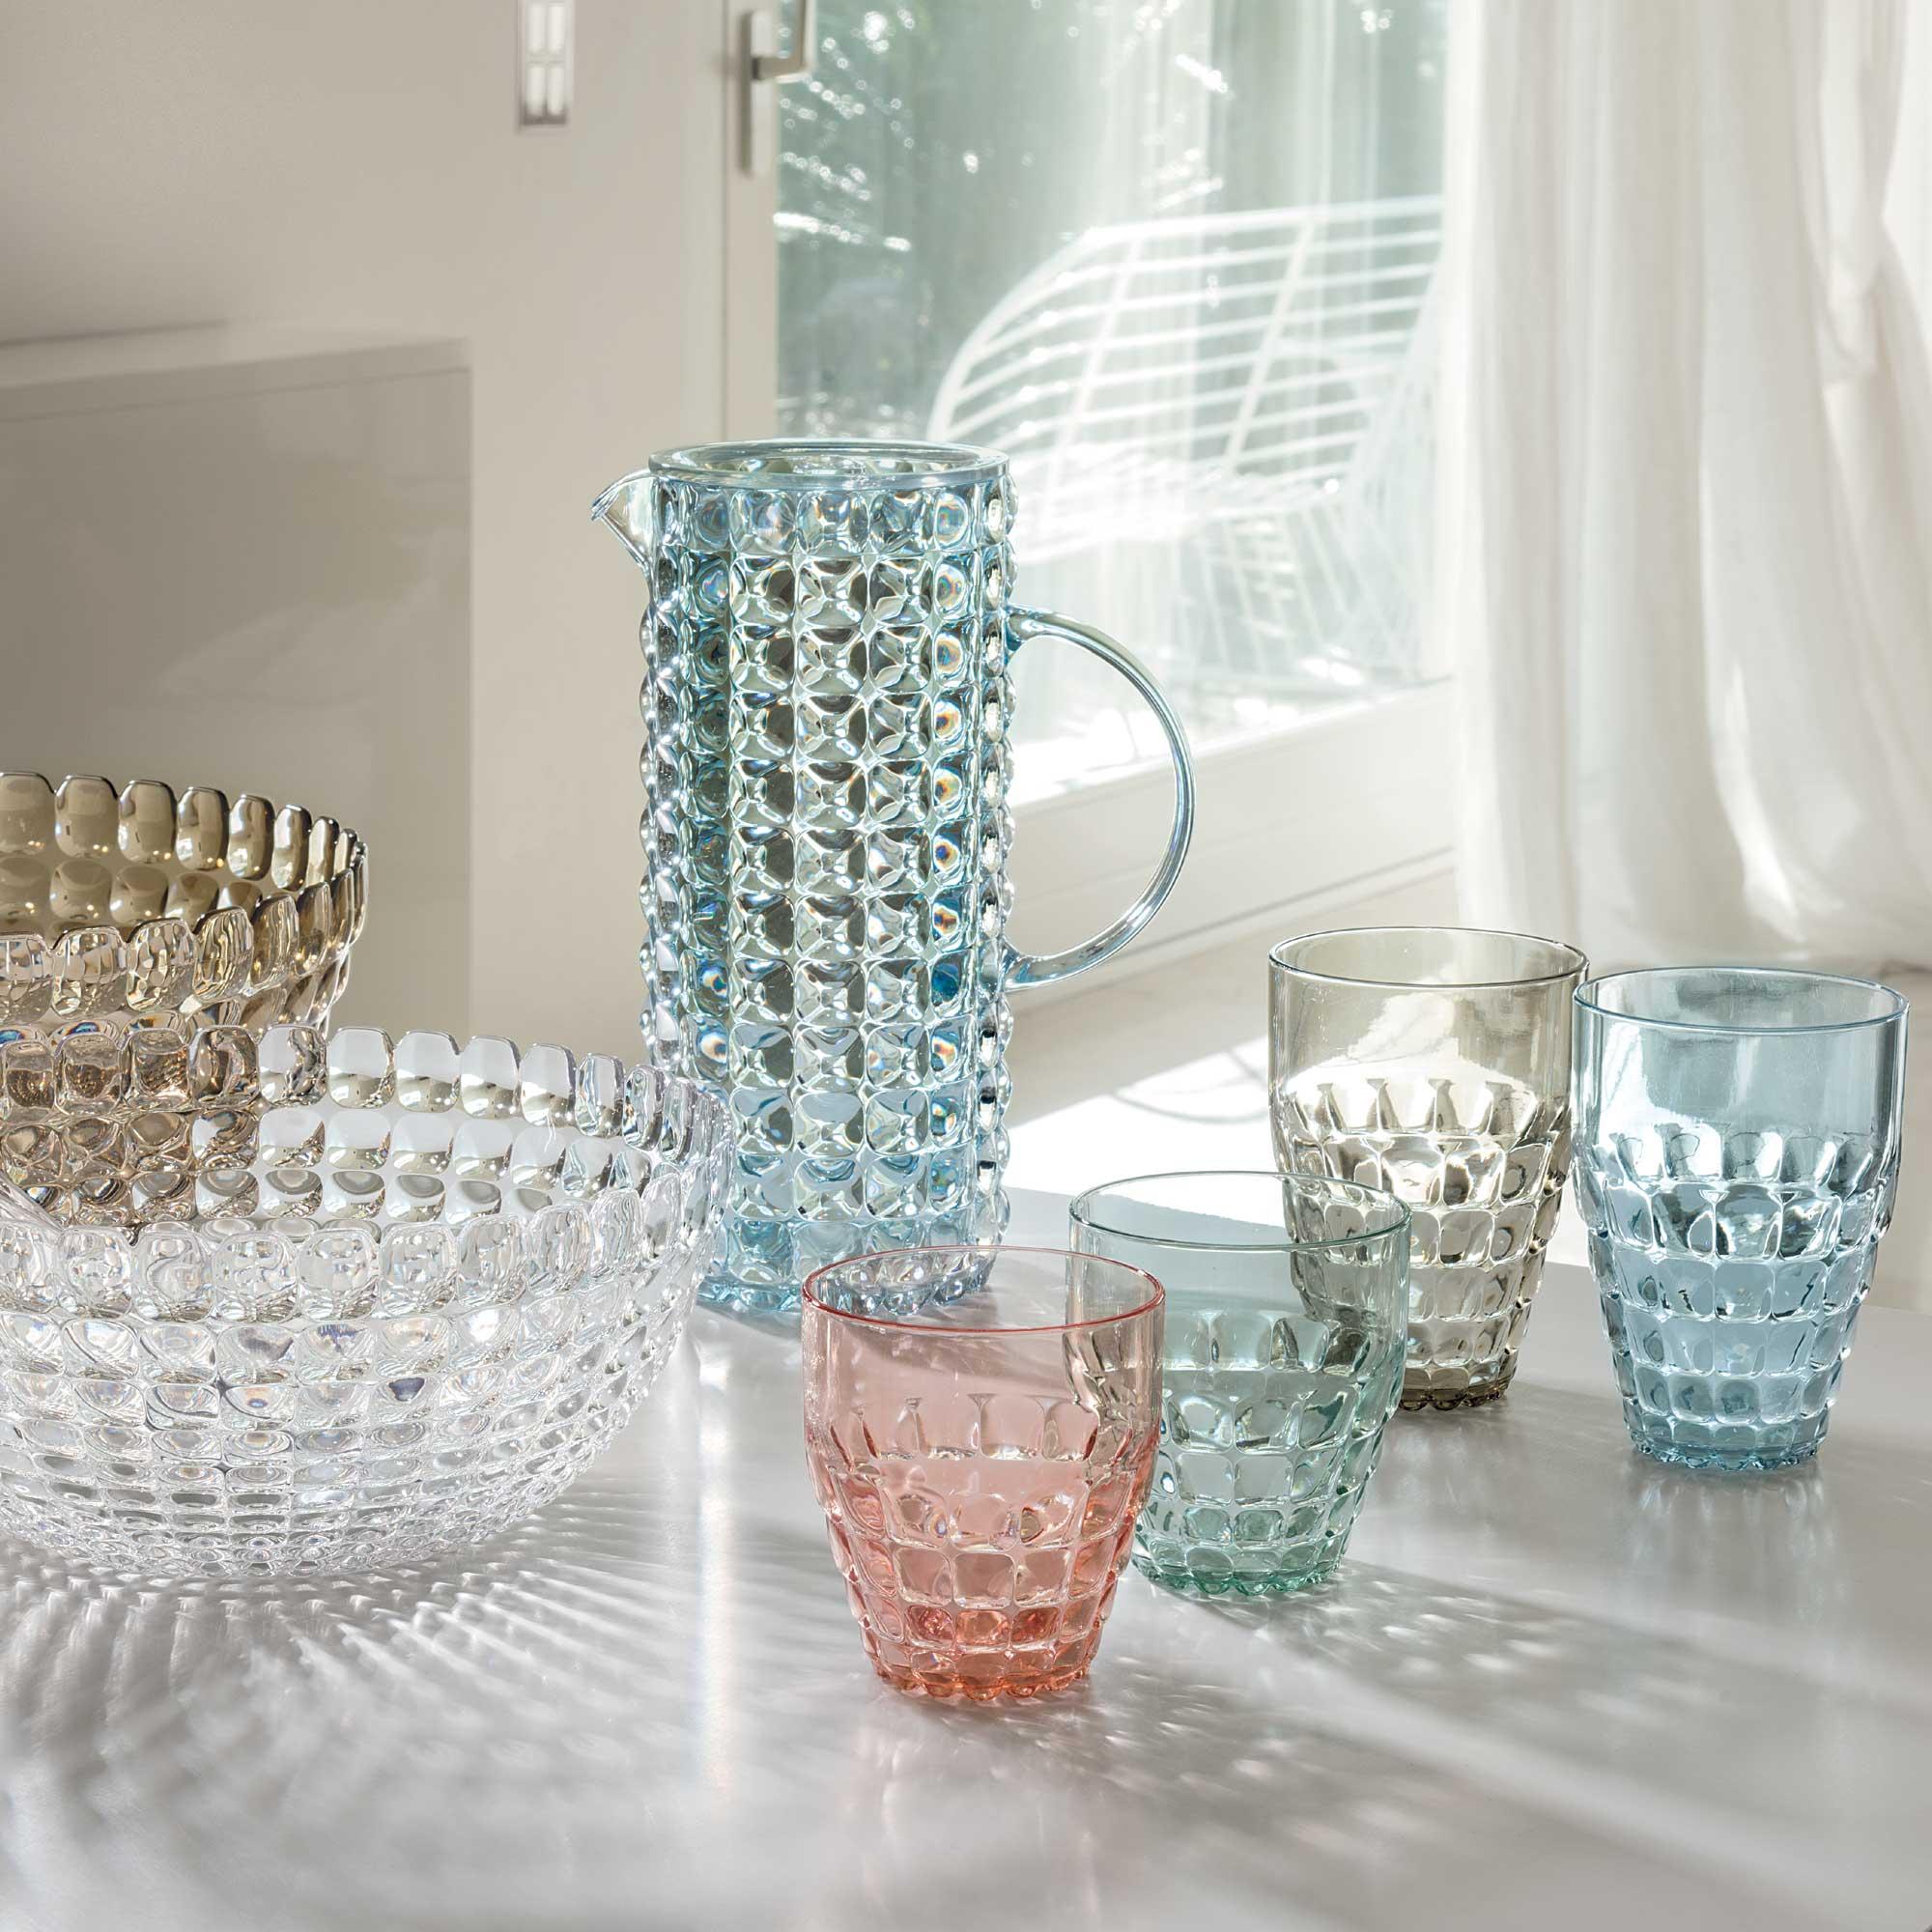 guzzini tiffany  Guzzini Tiffany Low Plastic Tumblers (Set of 6 - Same Colour) (350ml)